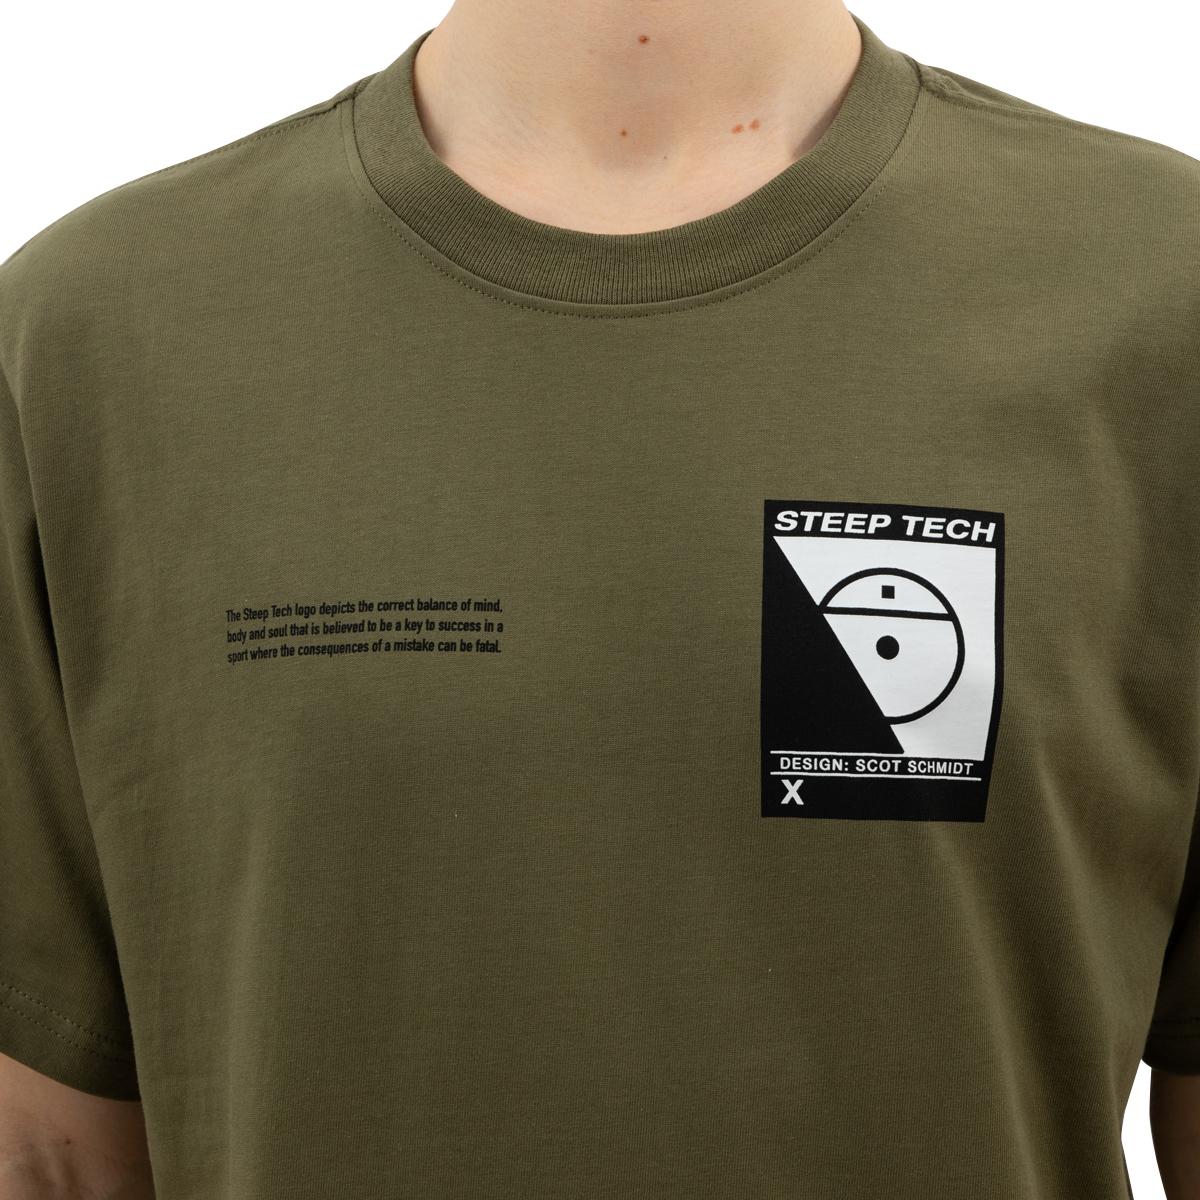 The North Face S/S Steep Tech Logo Tee